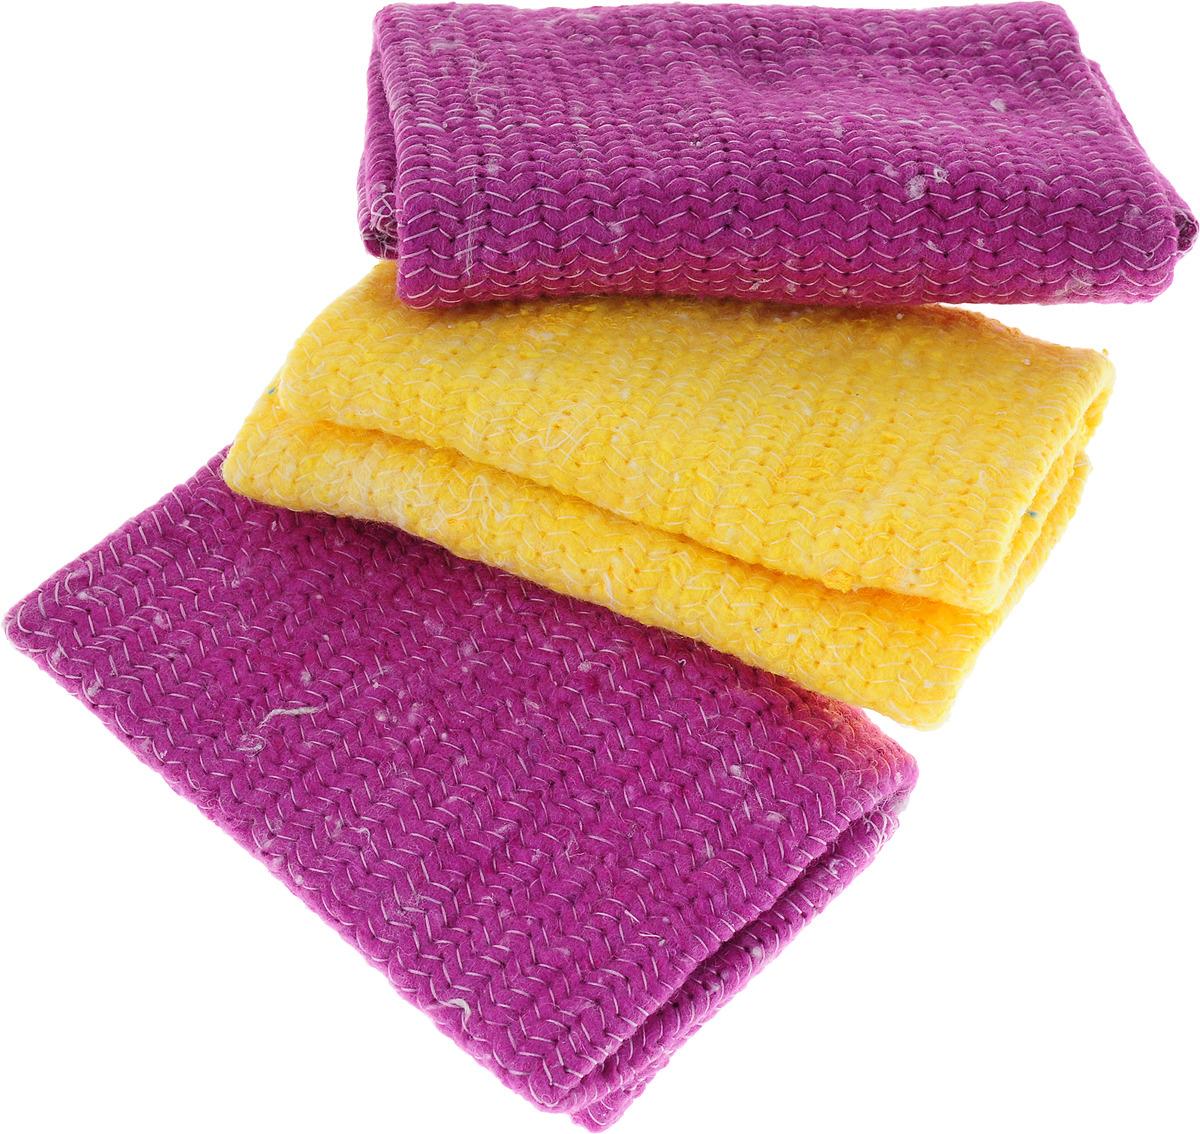 Набор салфеток для уборки Лайма Премиум, цвет в ассортименте, 30 х 30 см, 3 шт2212345679122